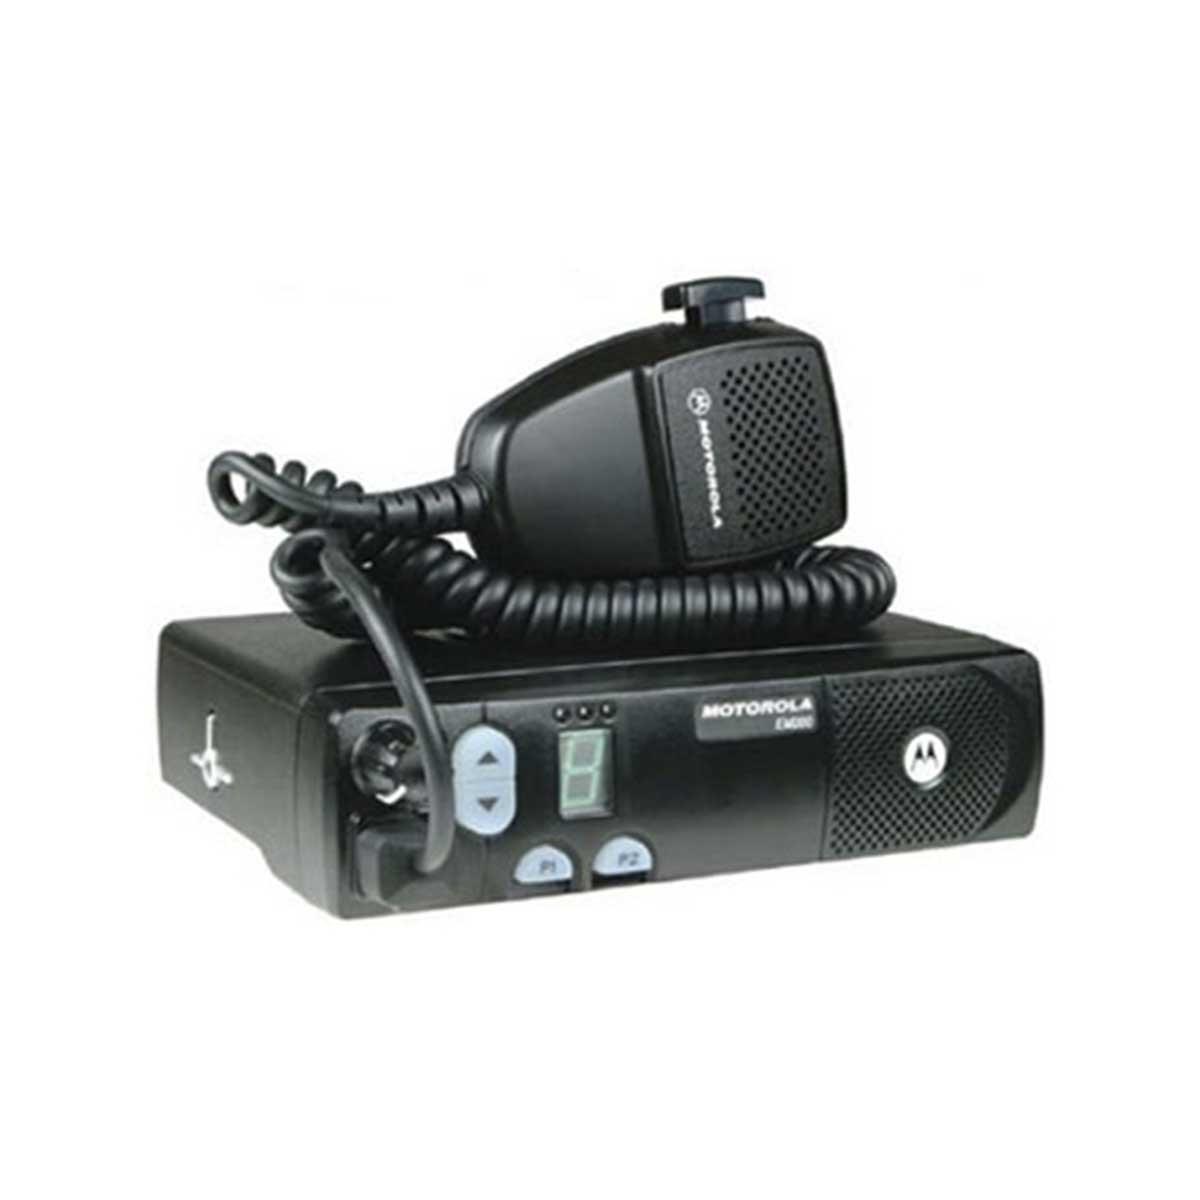 Radio Motorola EM200 Analógico LAM50RNC9AA1AN UHF 438-470 MHz